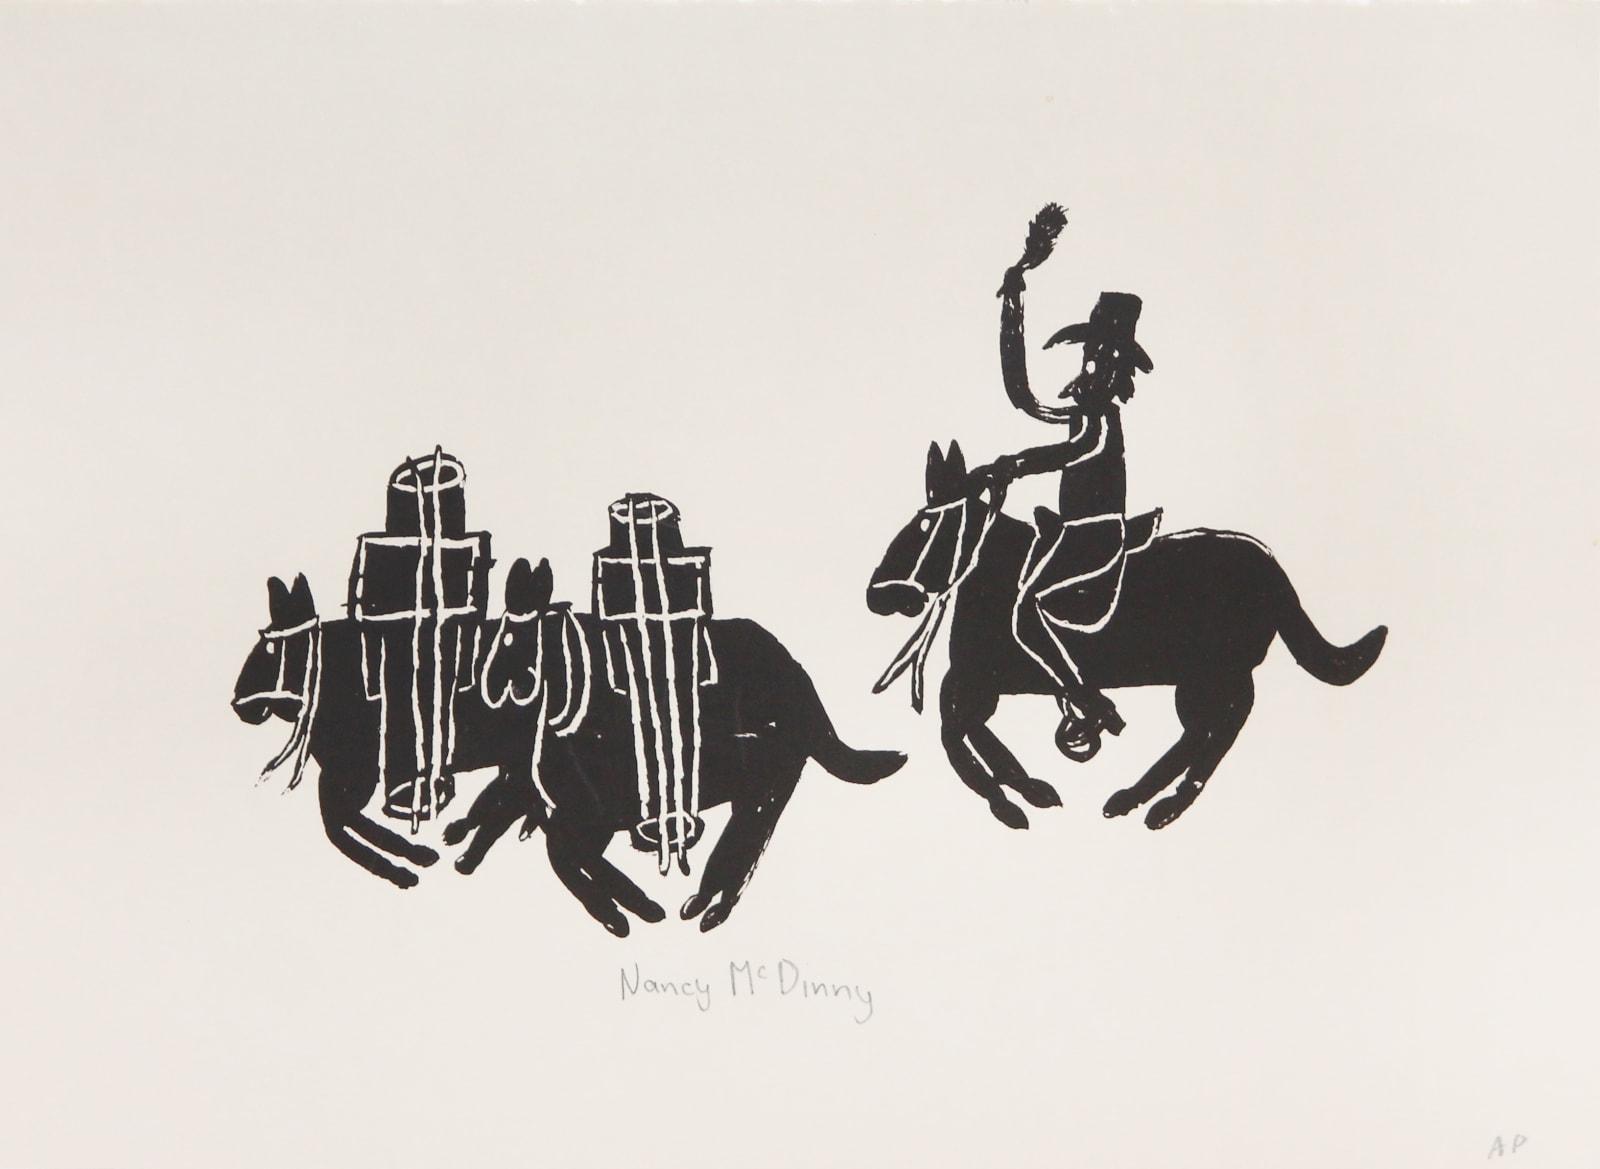 Nancy Mcdinny, Pack Horse and Saddler, 2009